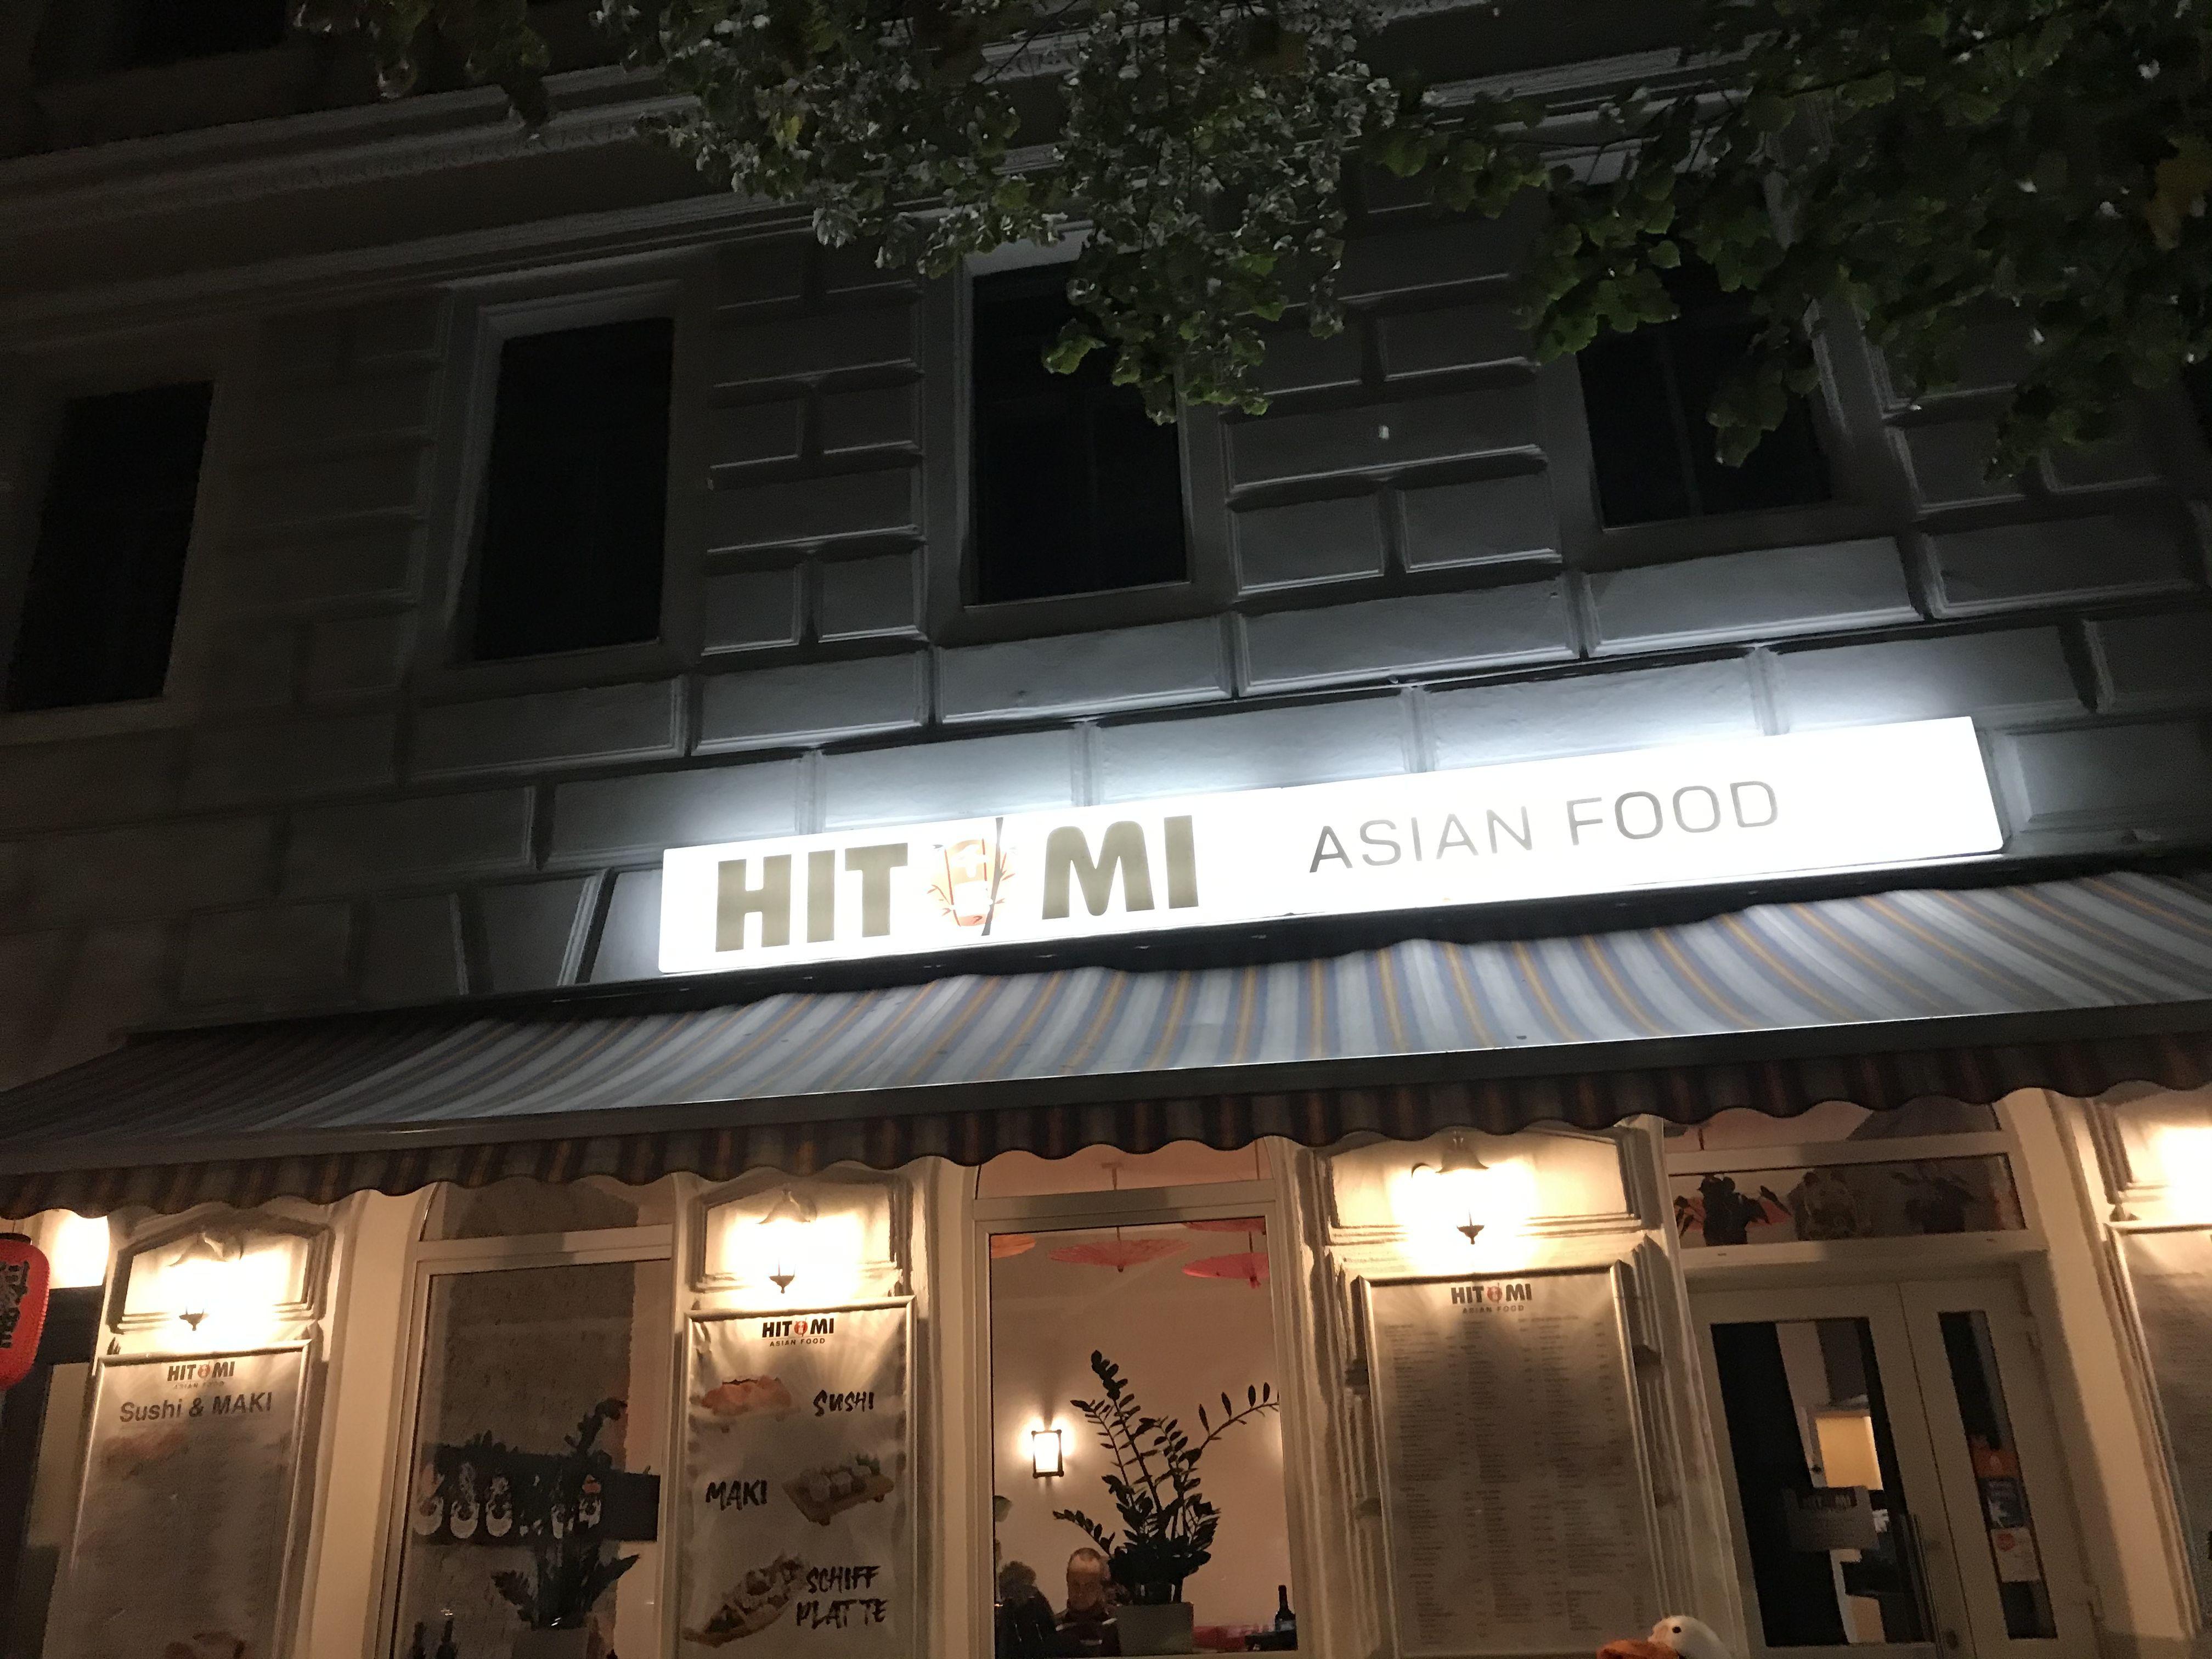 As seen in vienna, Austria